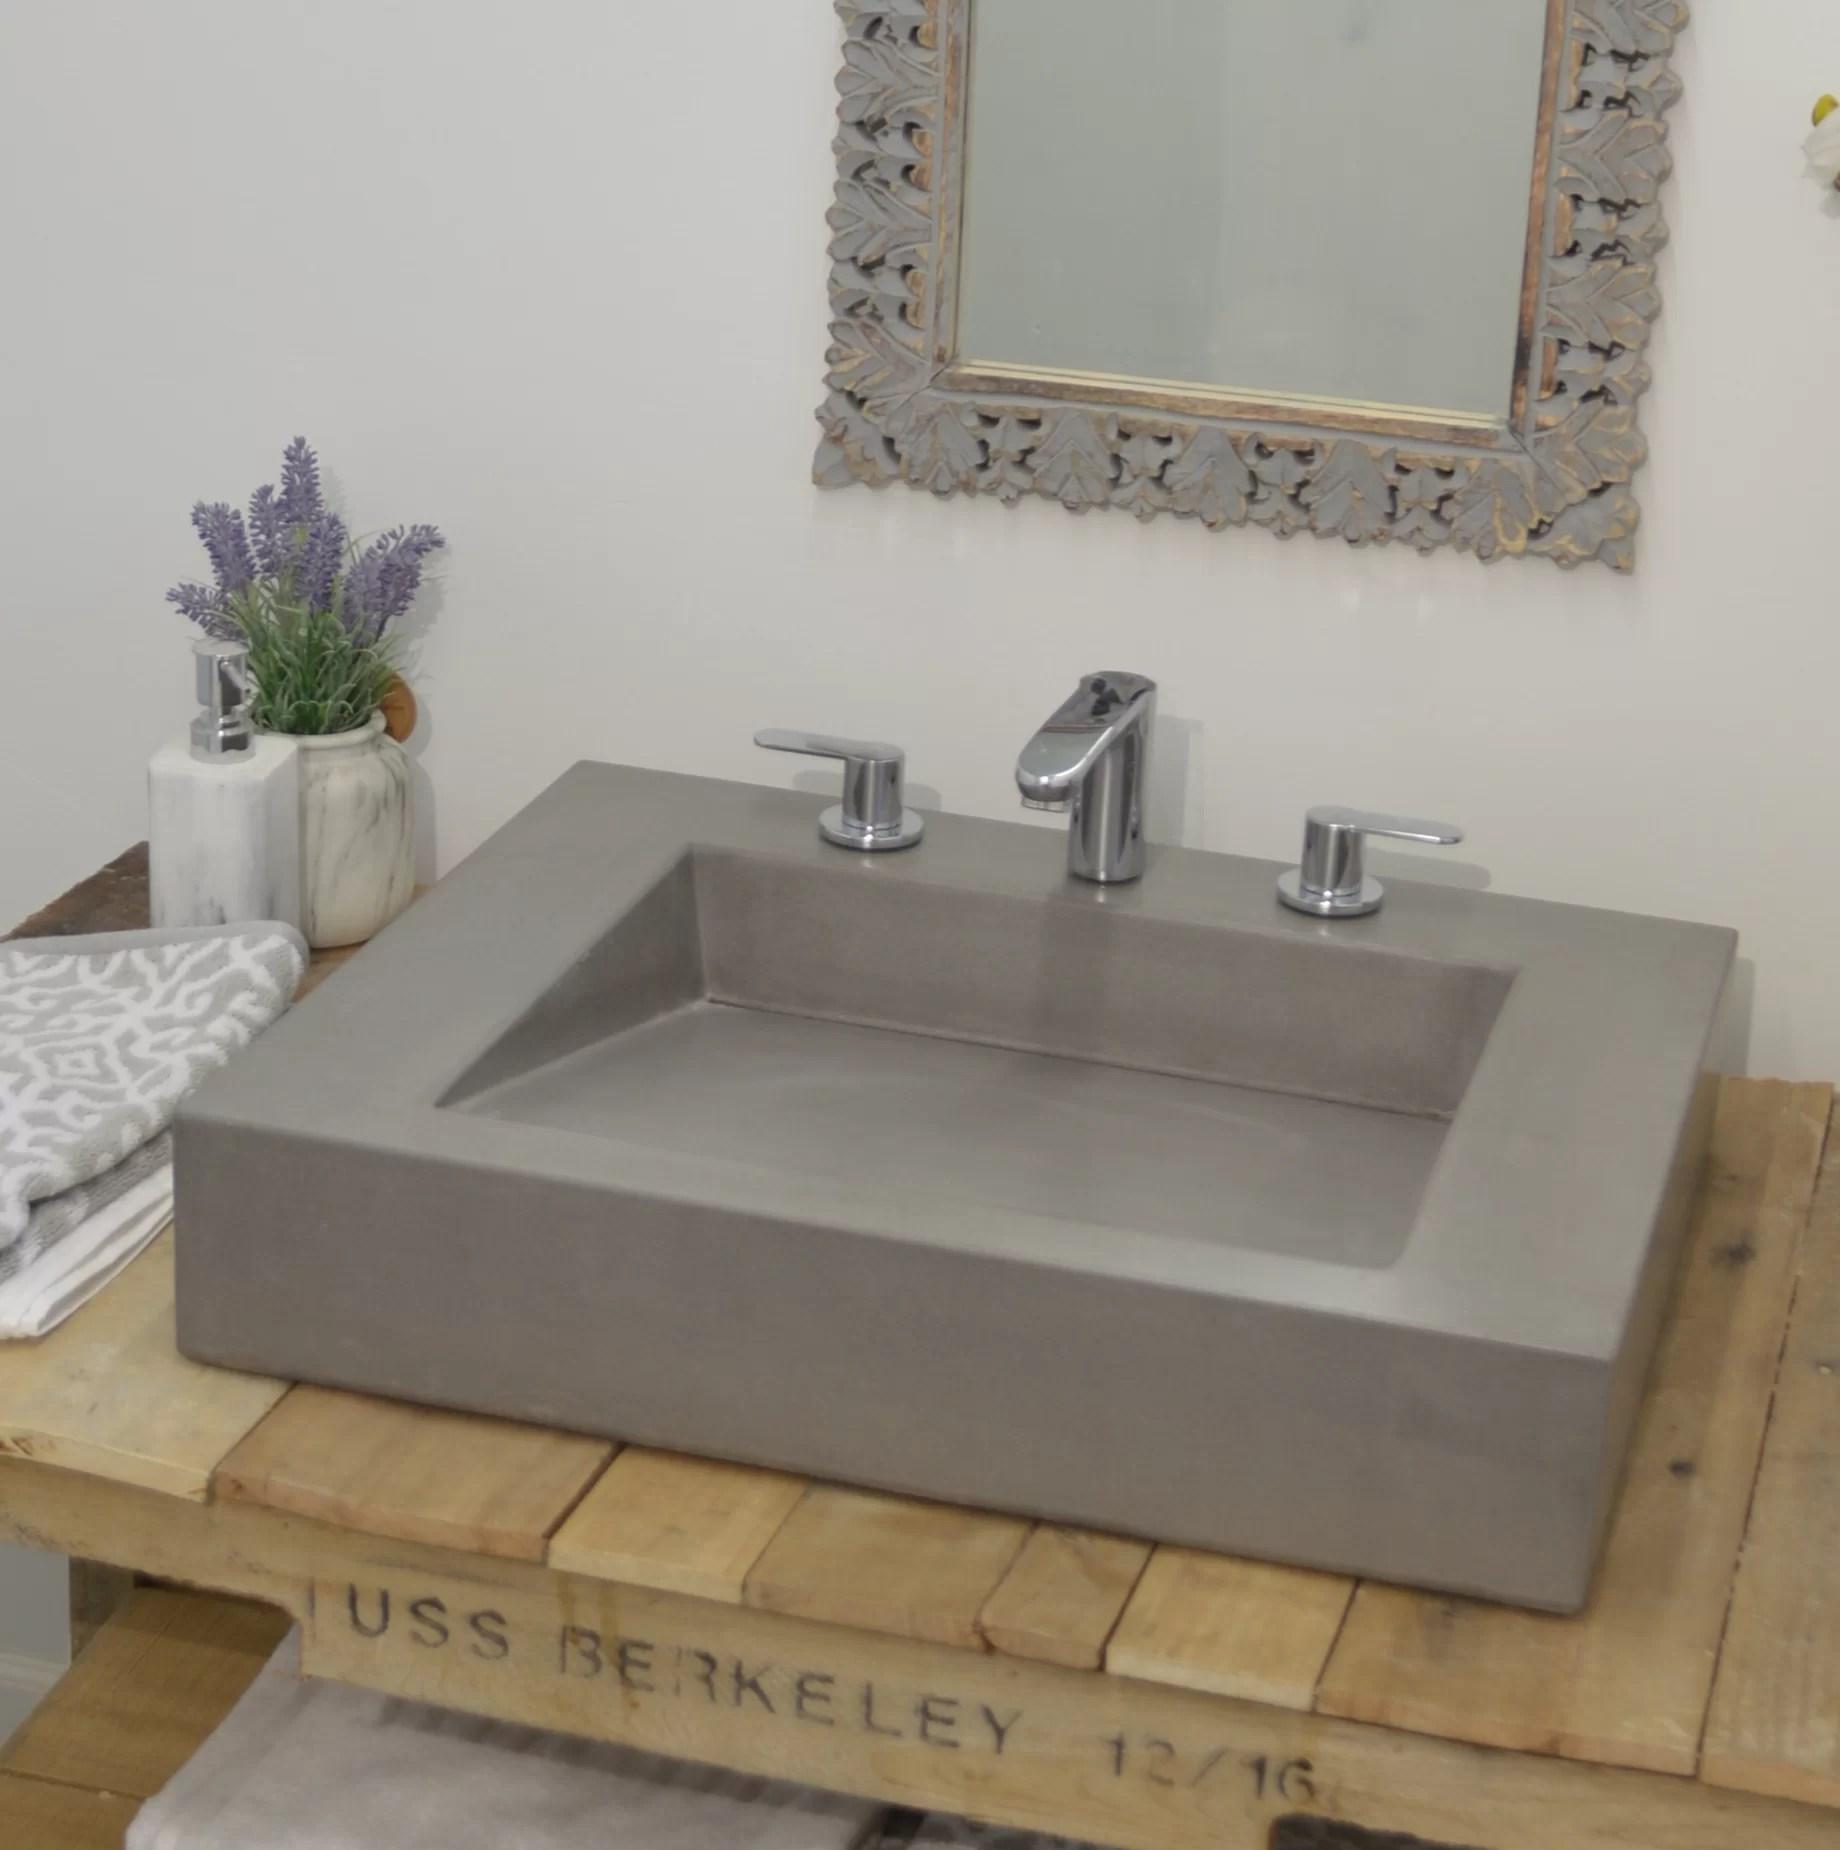 ramp double concrete rectangular vessel bathroom sink